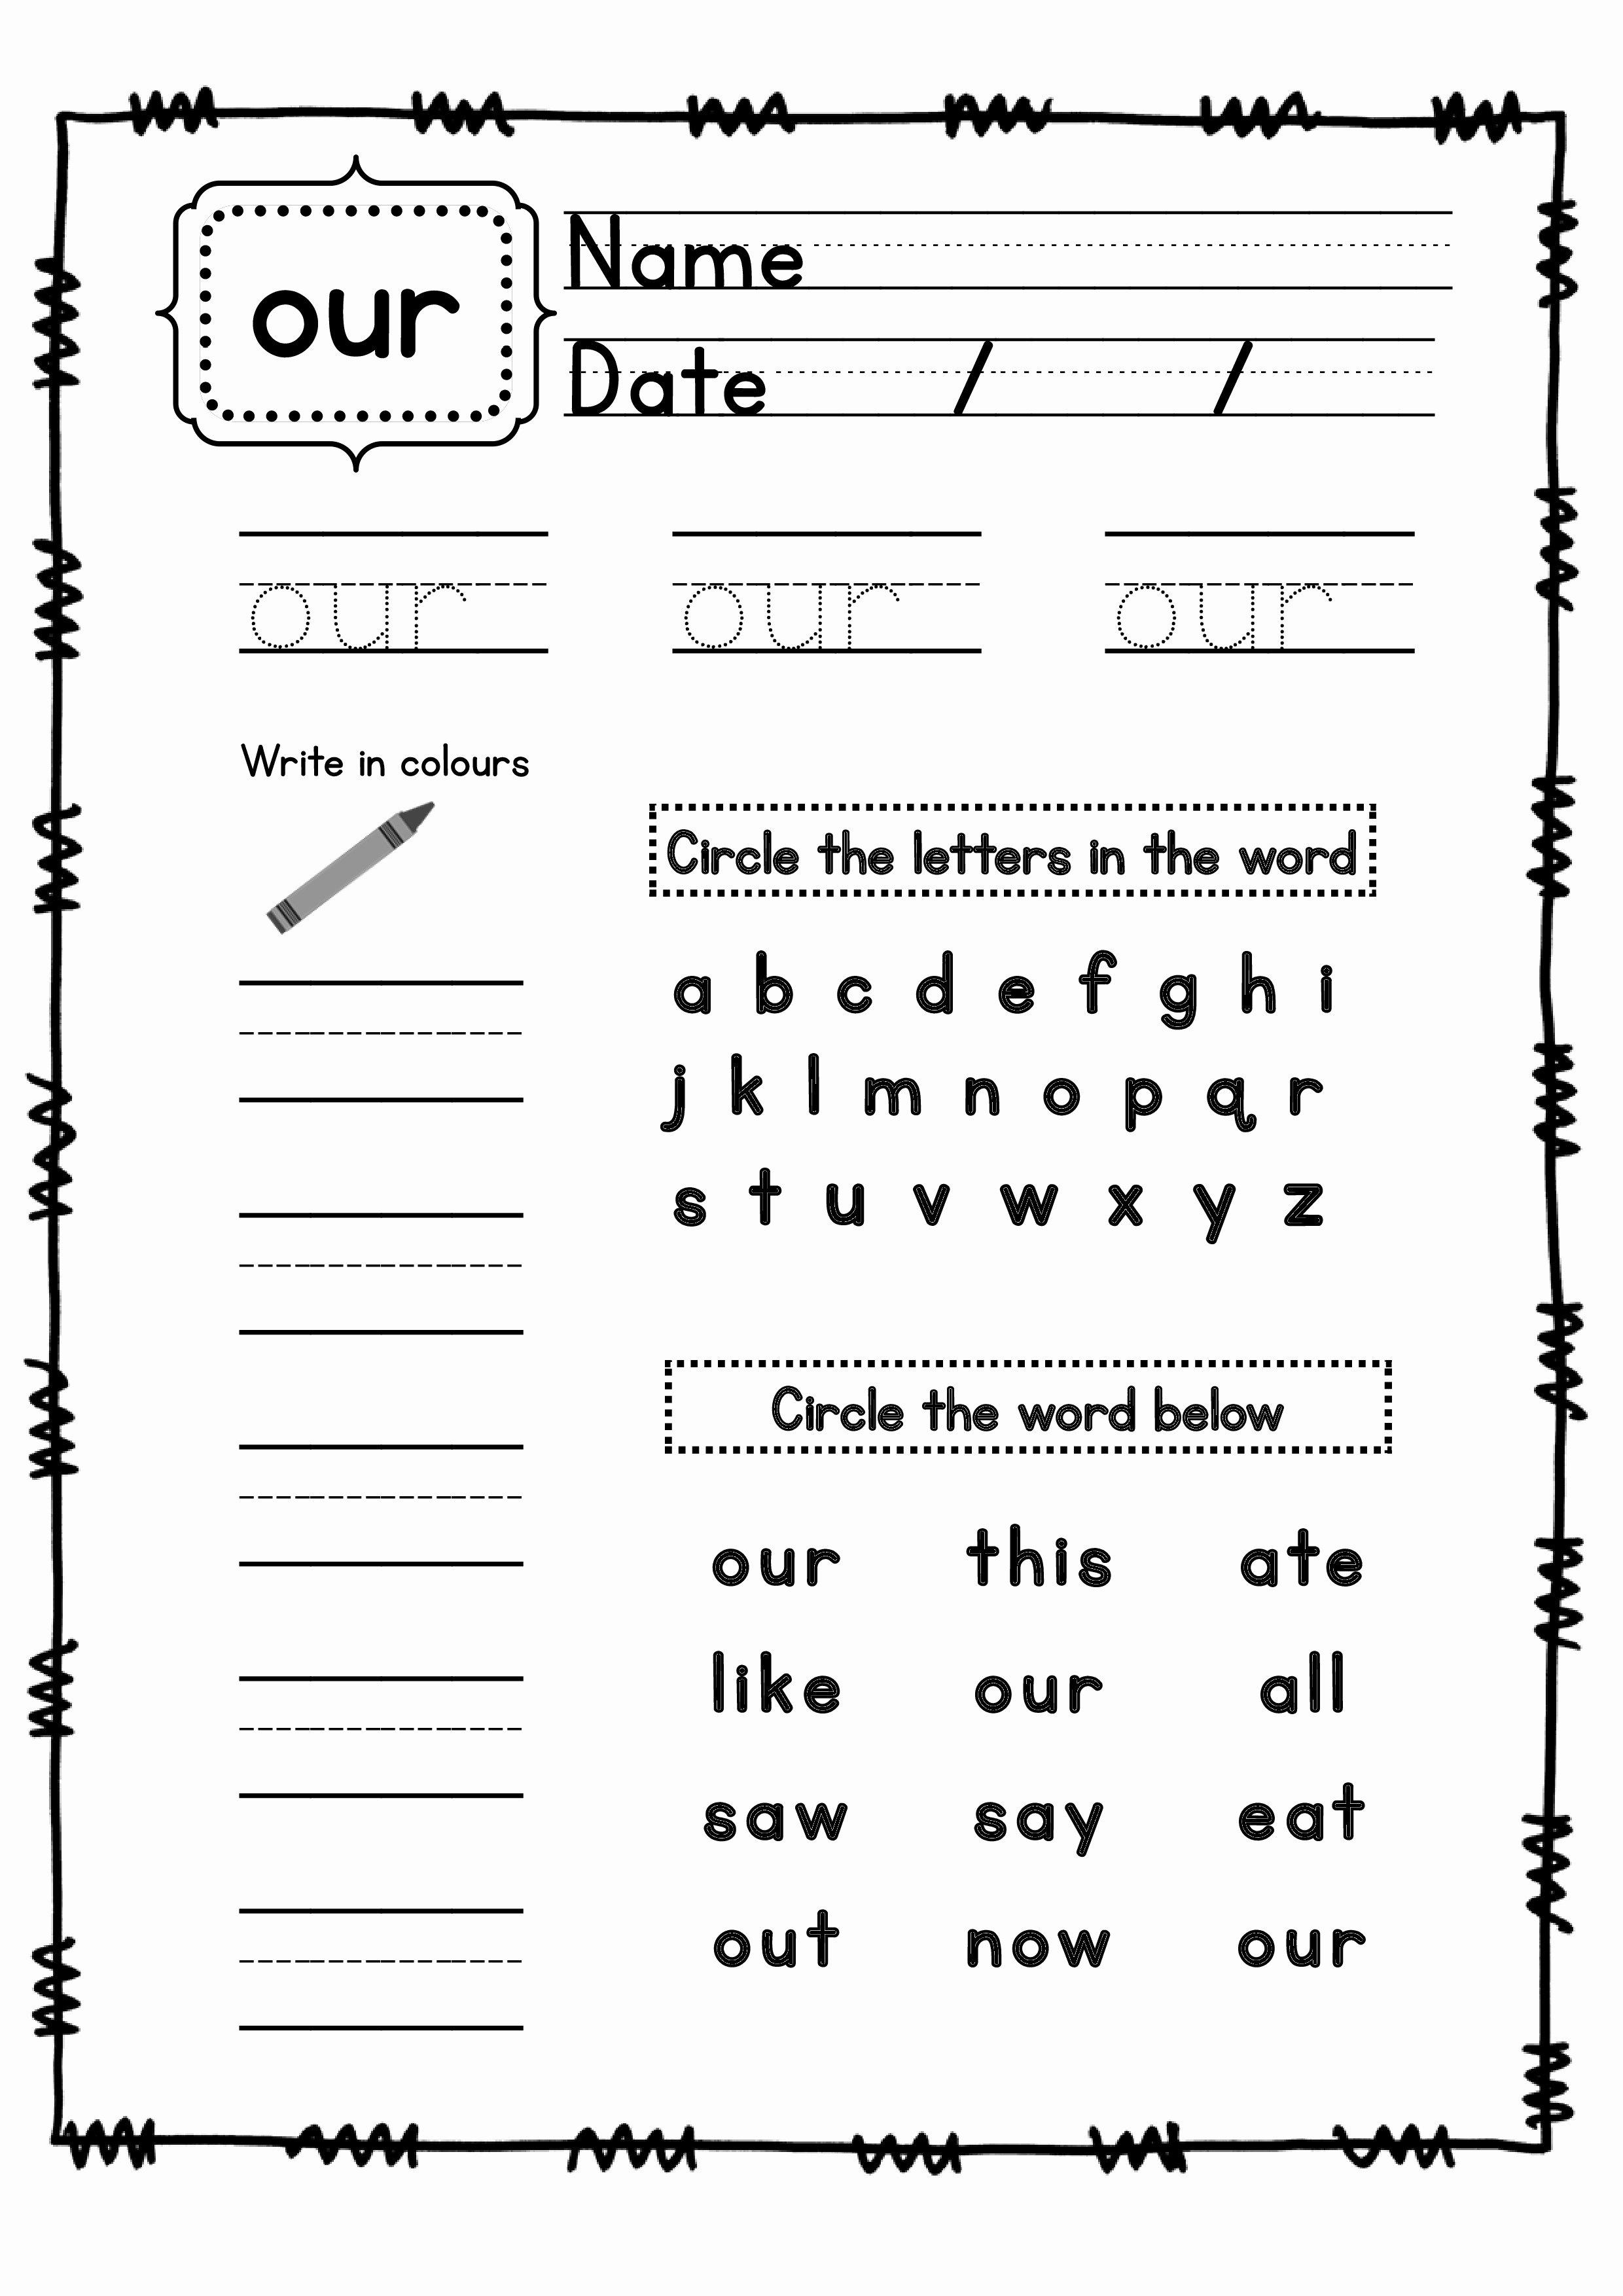 50 Sight Word Like Worksheet